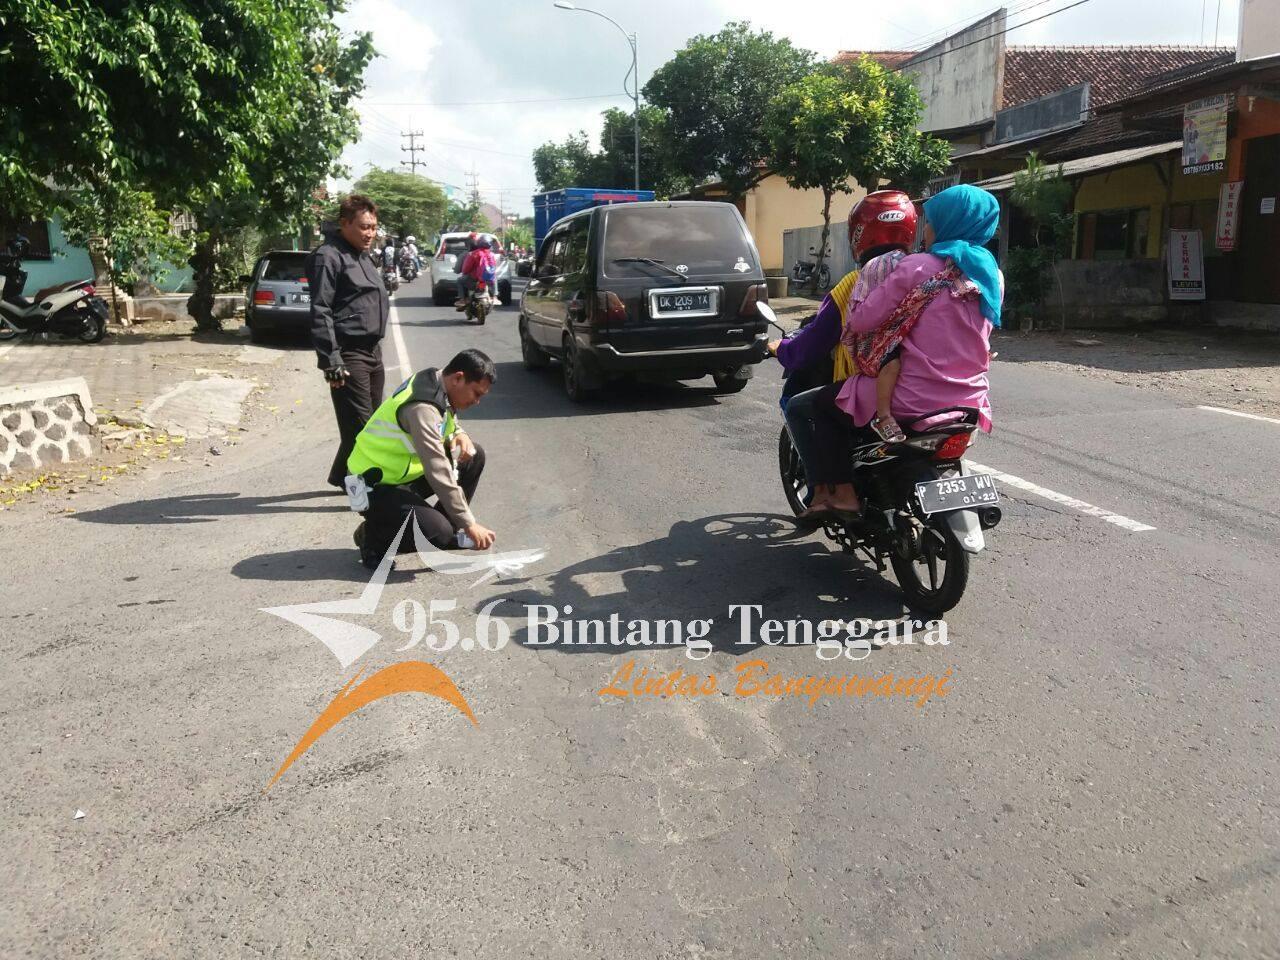 Petugas Melakukan Olah TKP Kejadian Laka Lantas di Gambiran. Minggu (02/07) (Foto. Hatta)